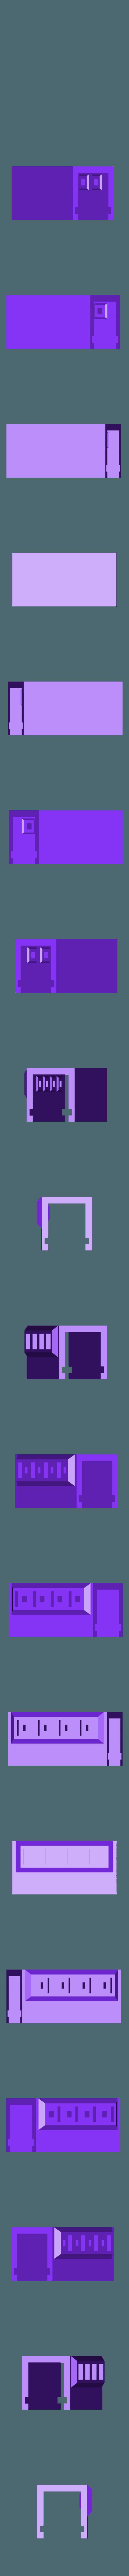 Valve_Body.stl Download free STL file Four Whistles • 3D print object, gzumwalt